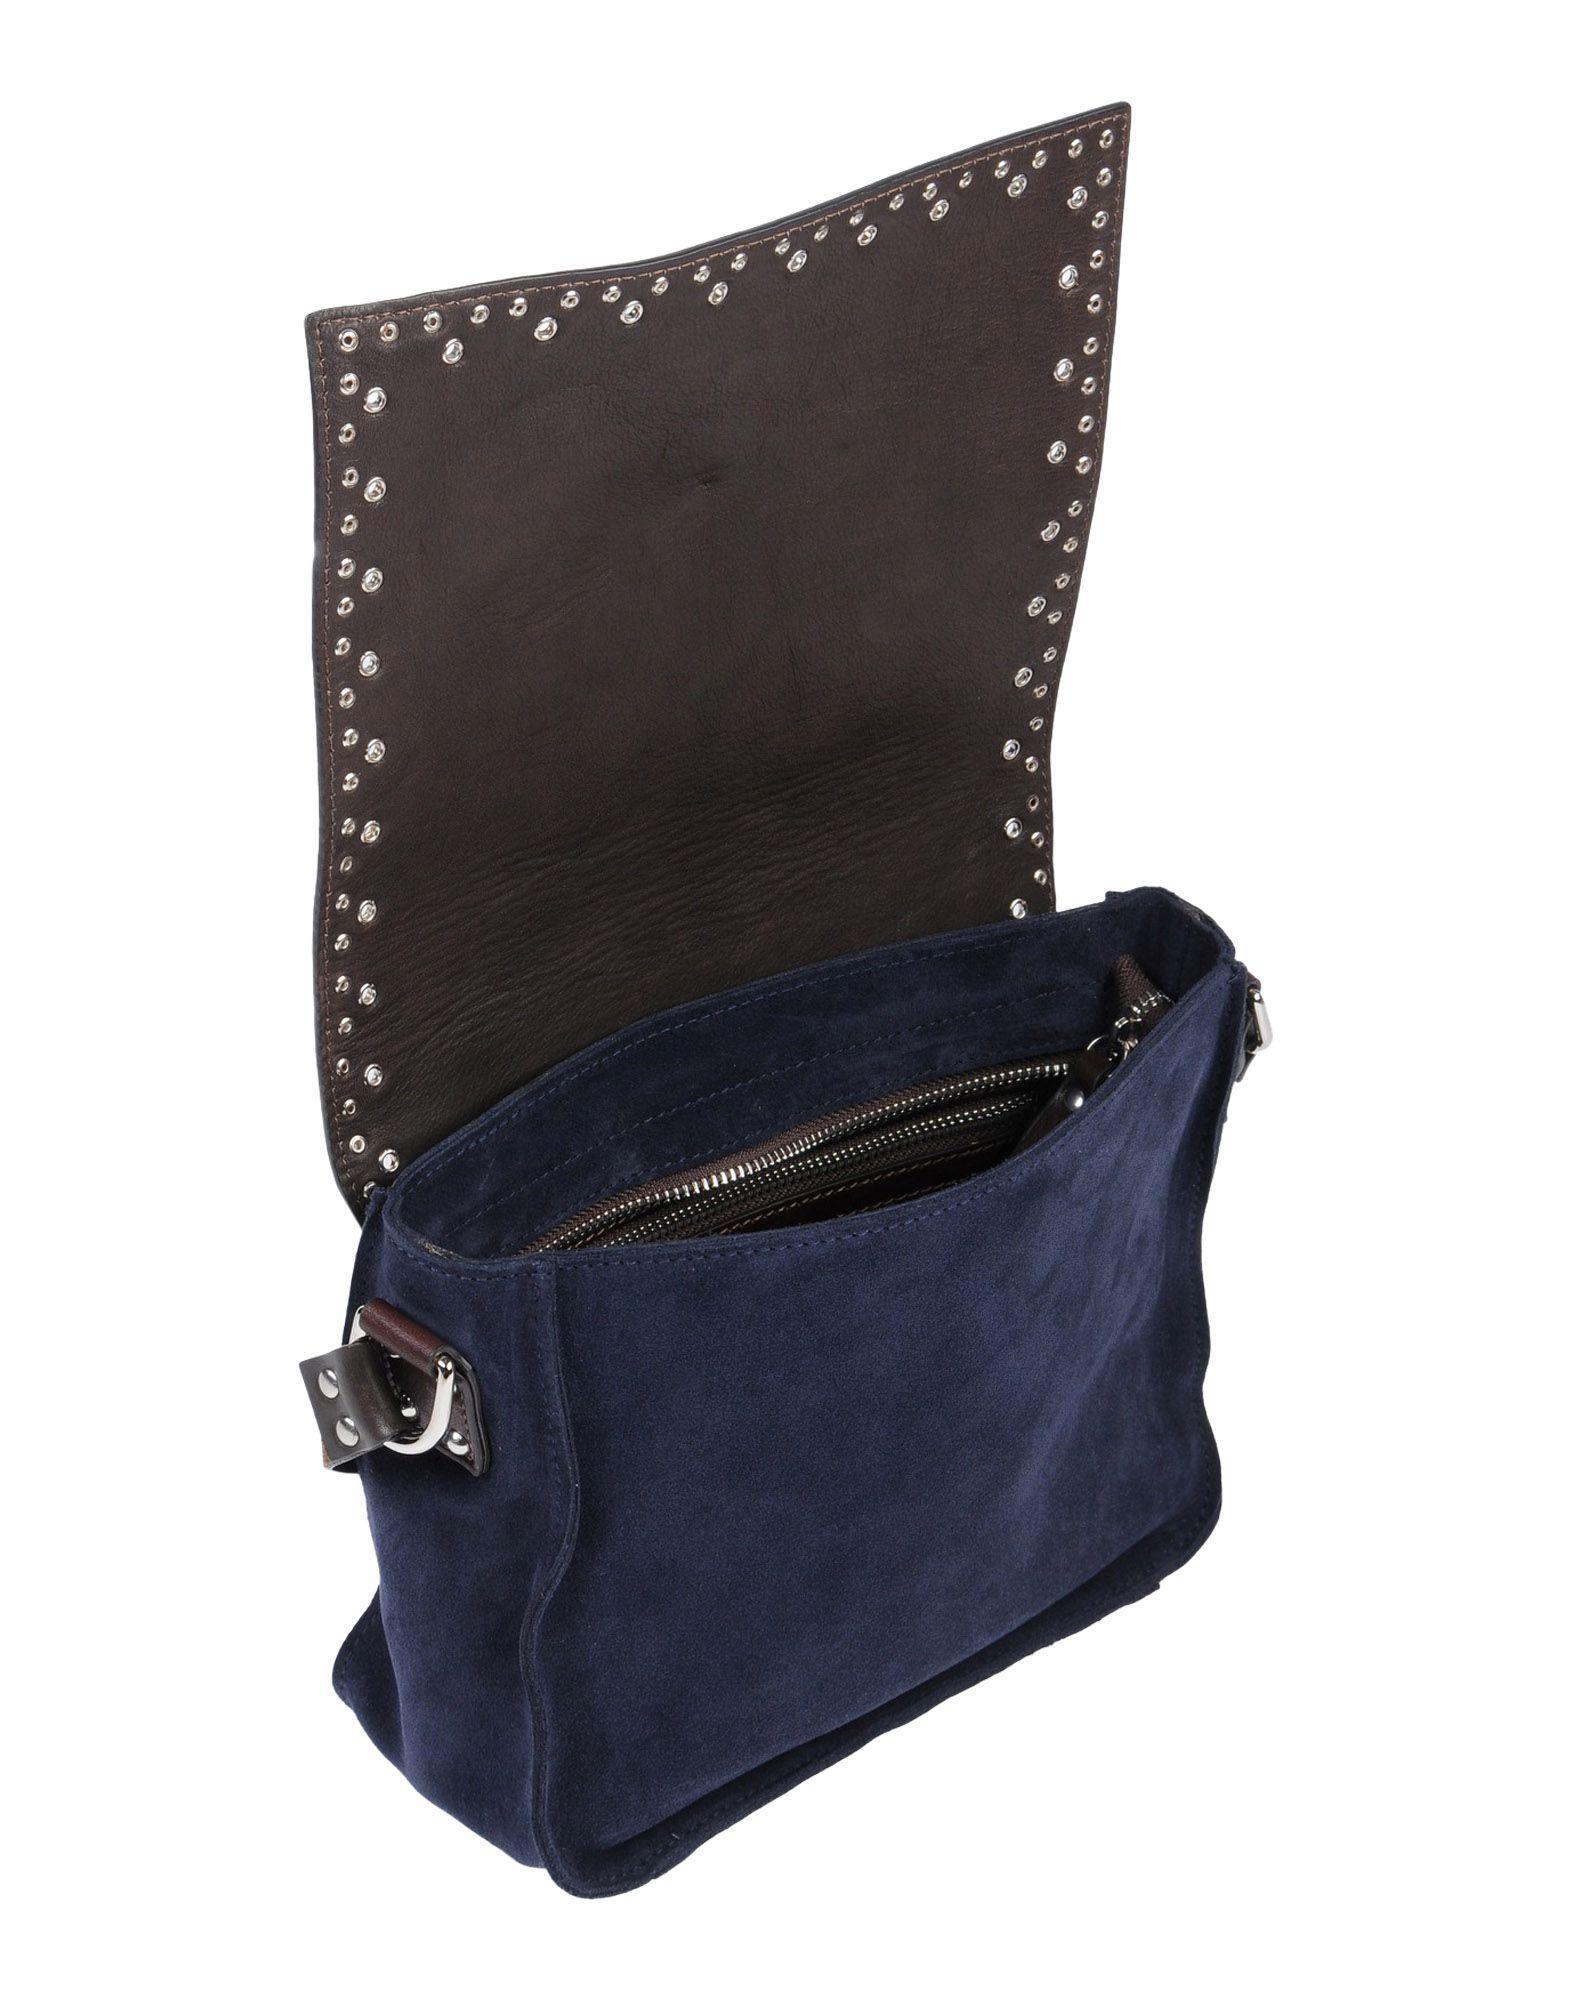 BAGS - Cross-body bags P.A.R.O.S.H. PZGv3QyVY